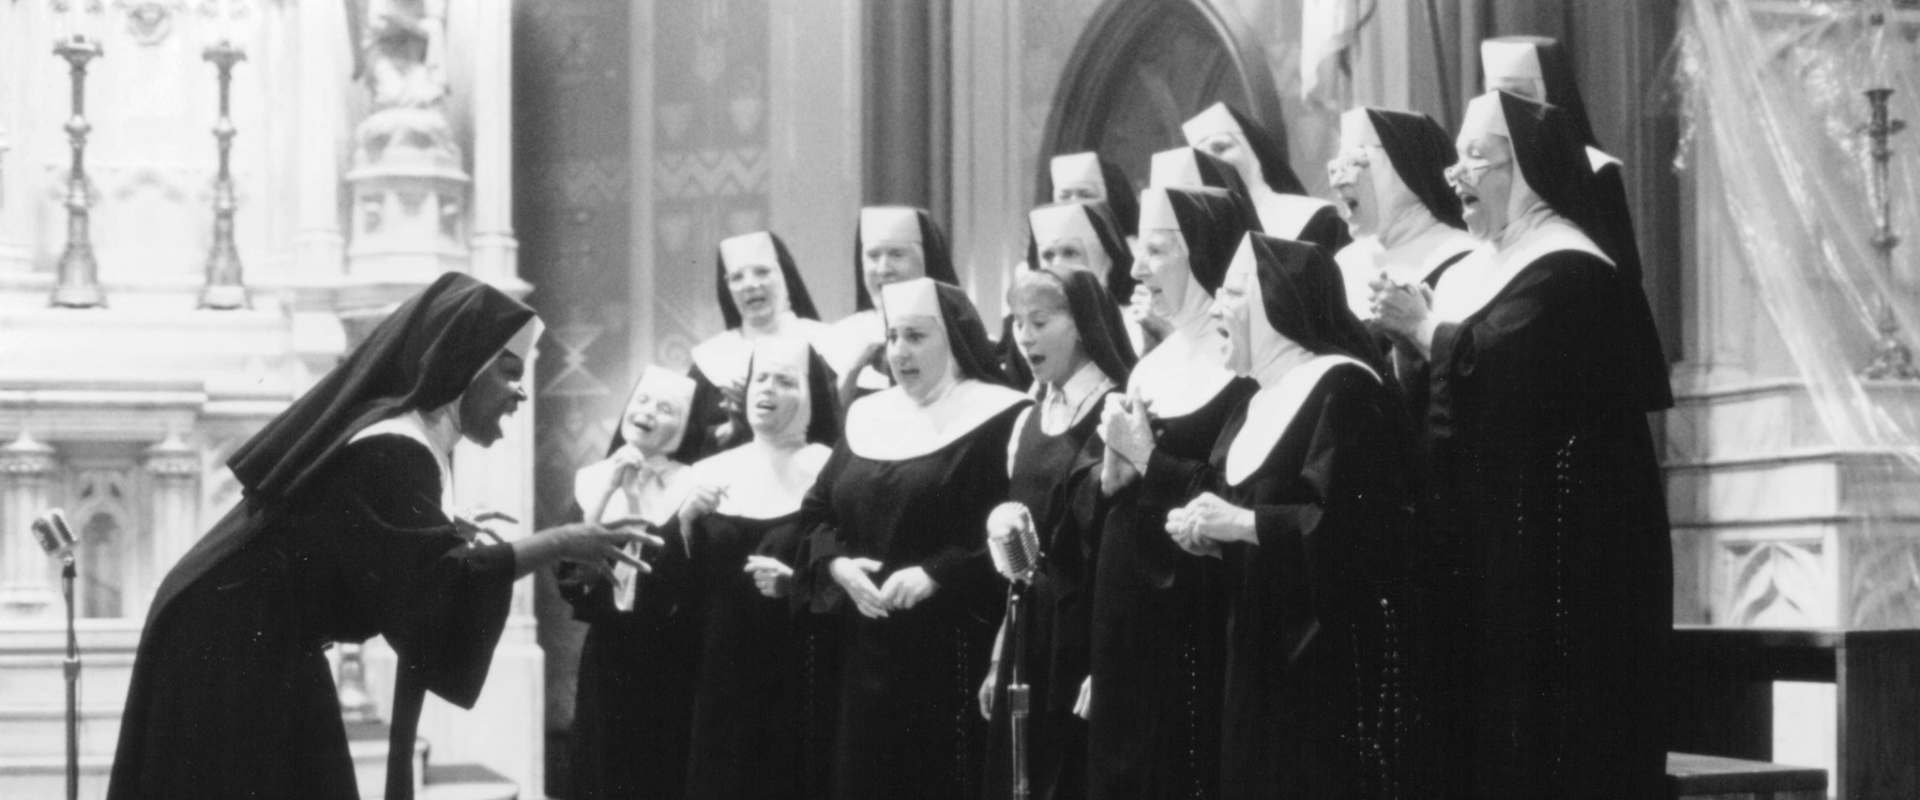 sister act full movie 1992 english free